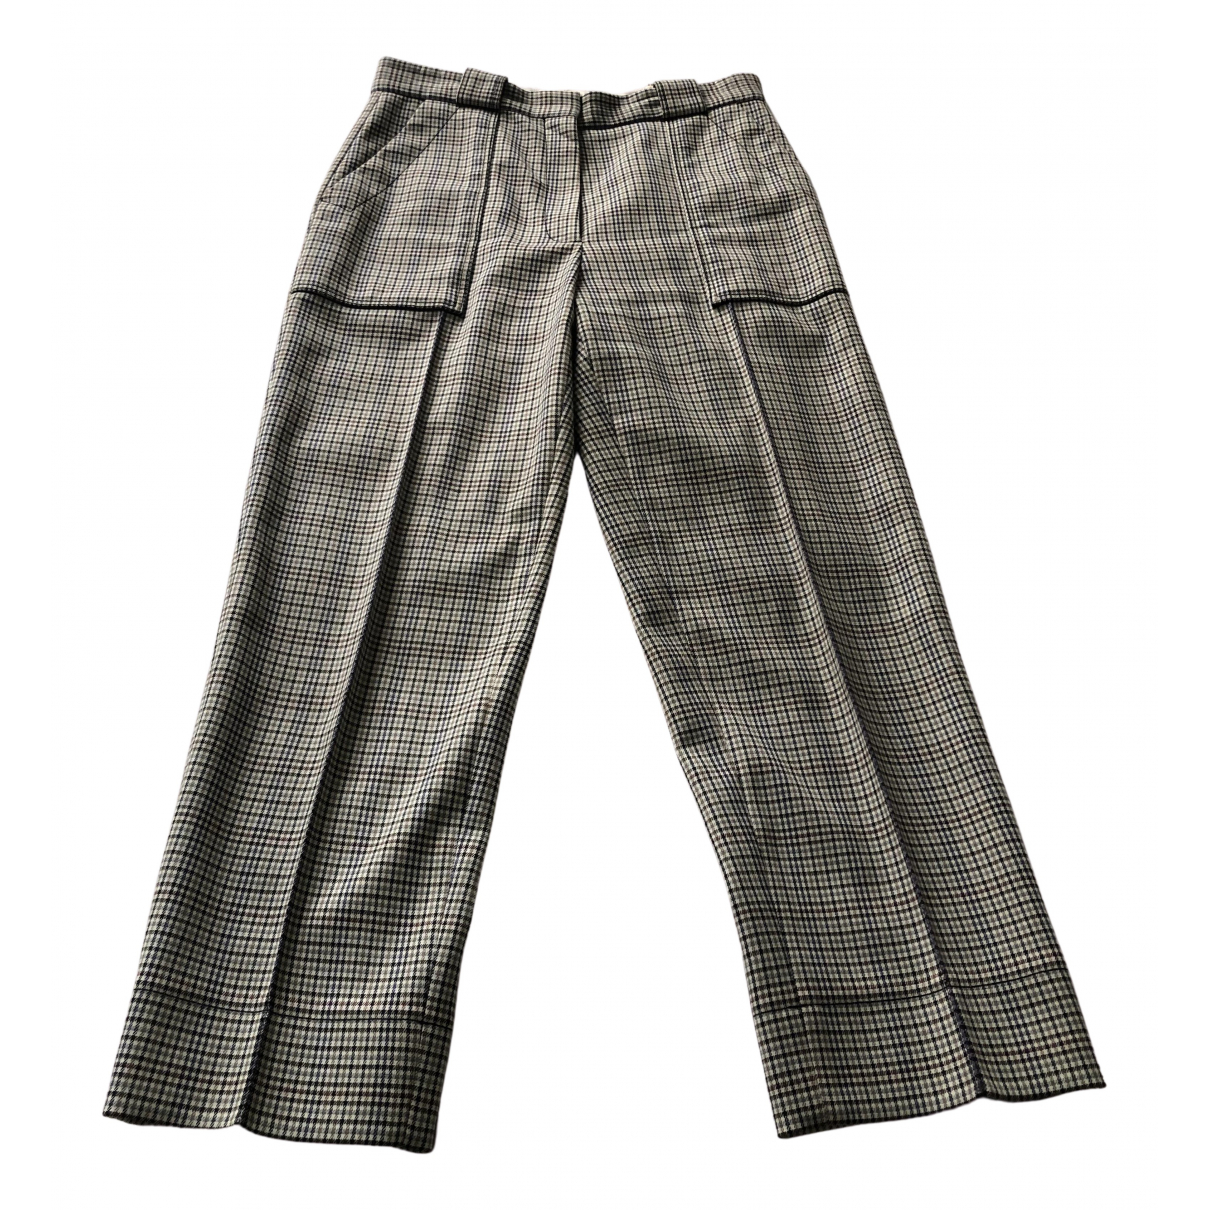 Sandro N Multicolour Cotton Trousers for Women 38 FR